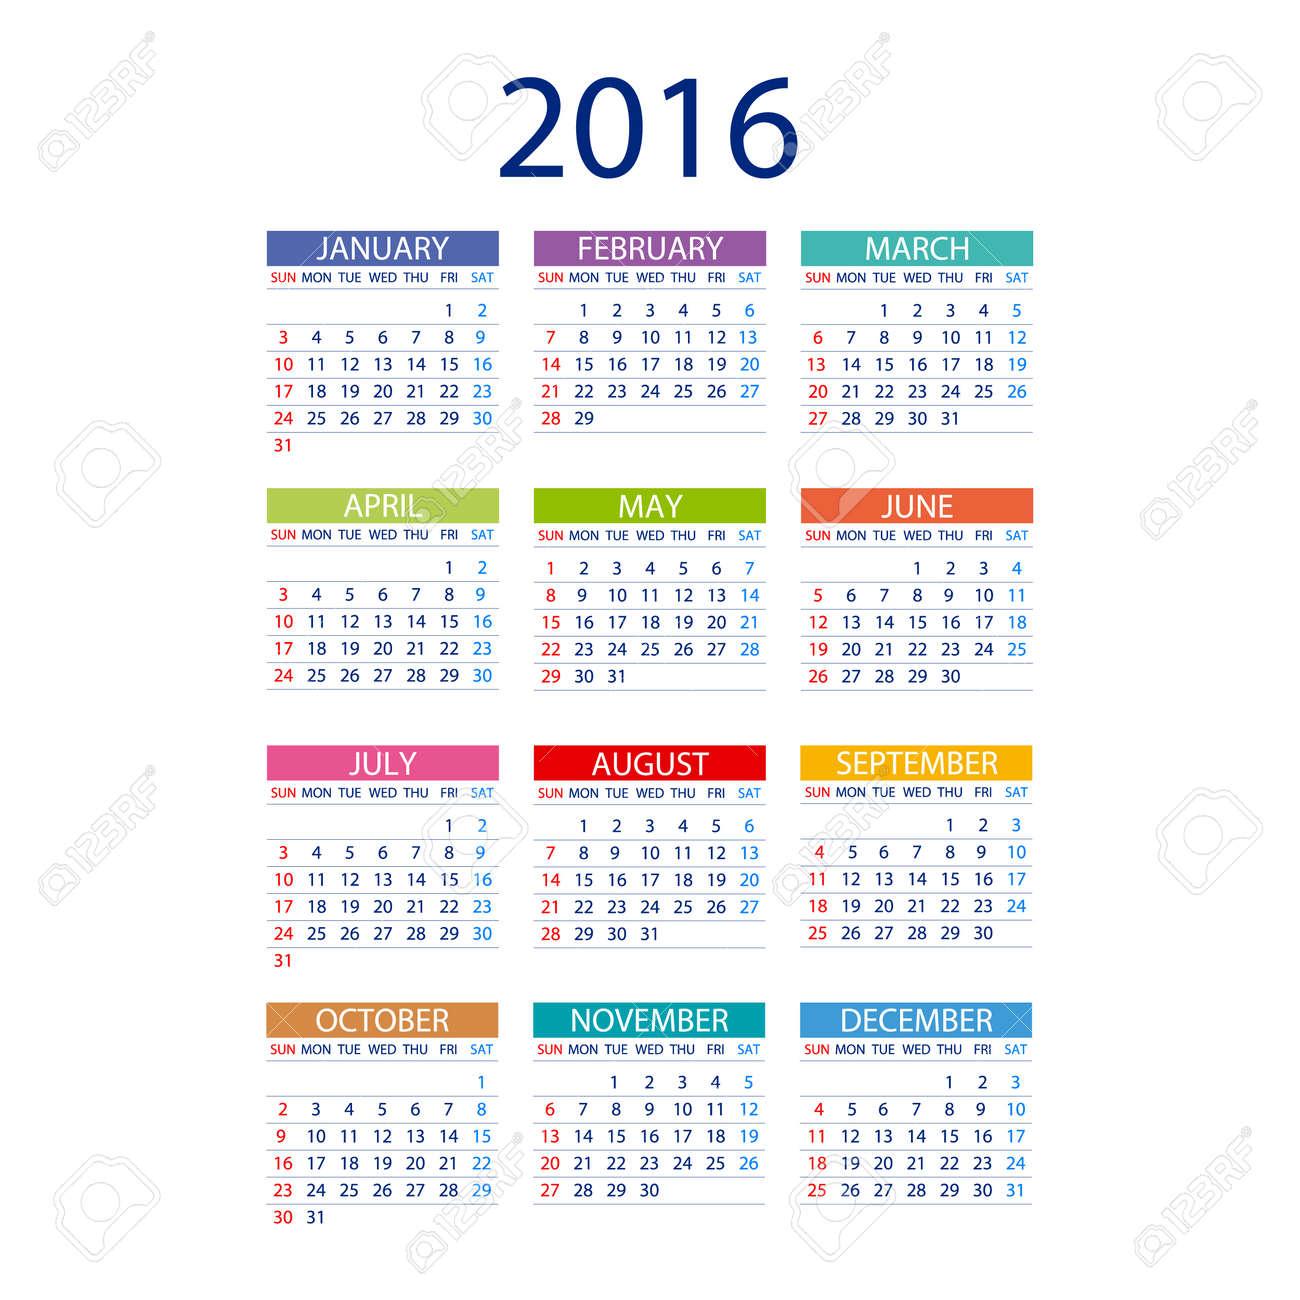 2016 Calendar Simple Design Art Vector Date Template Month Royalty